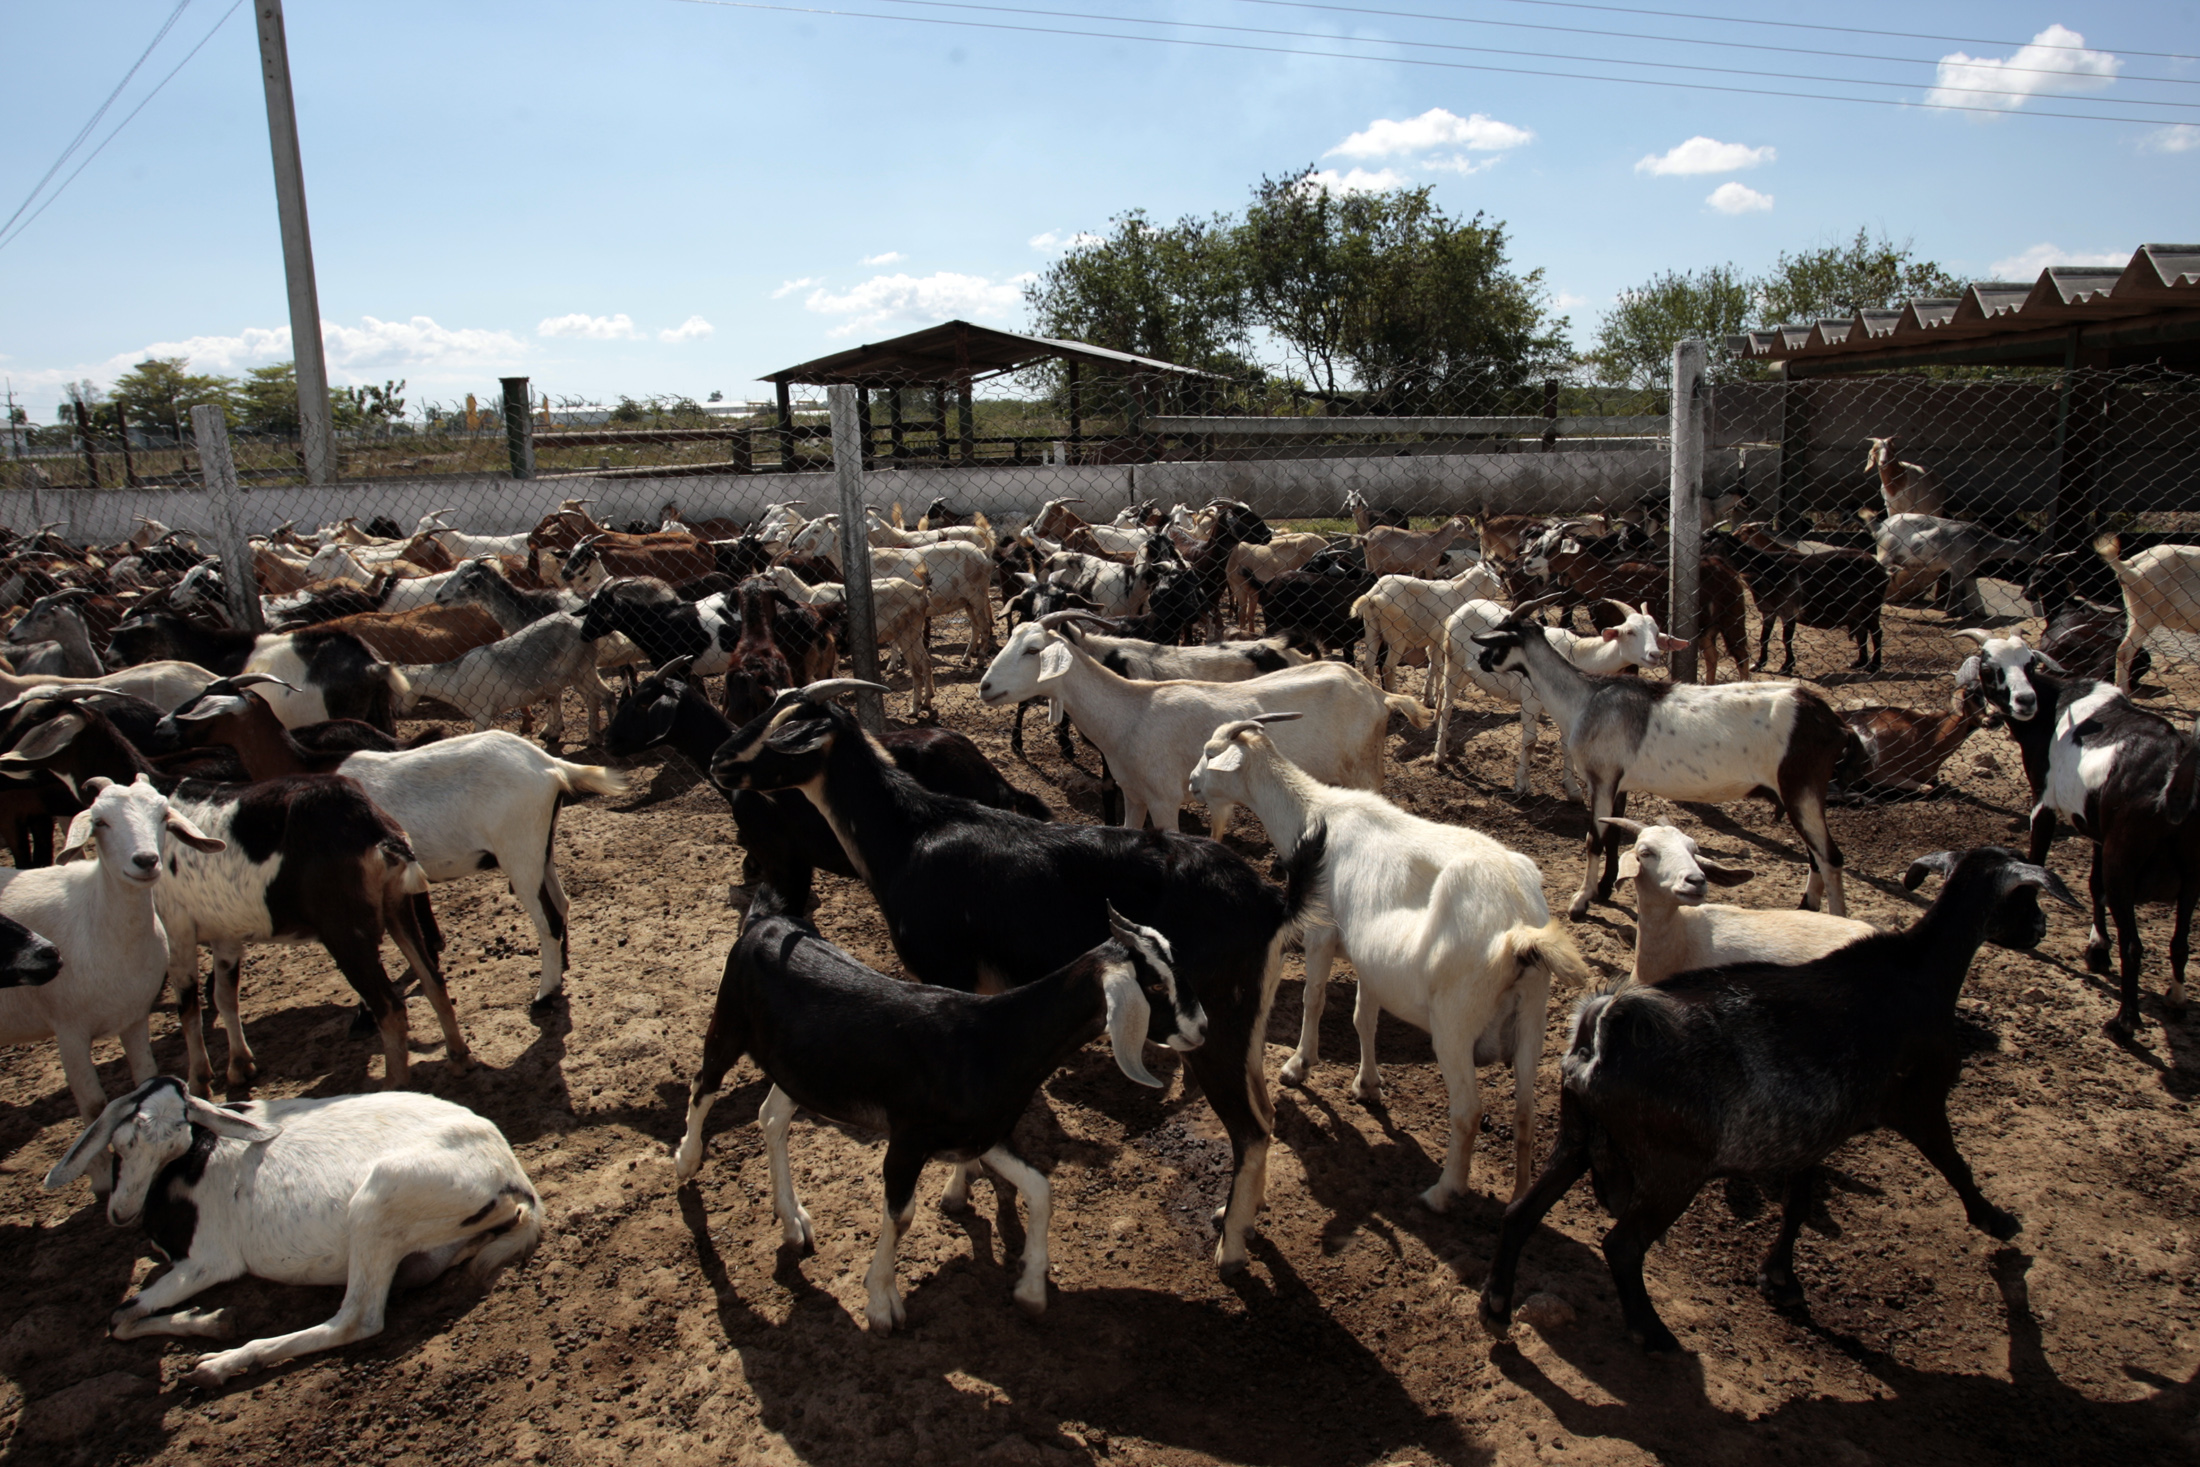 Cattle Farming Business Plan